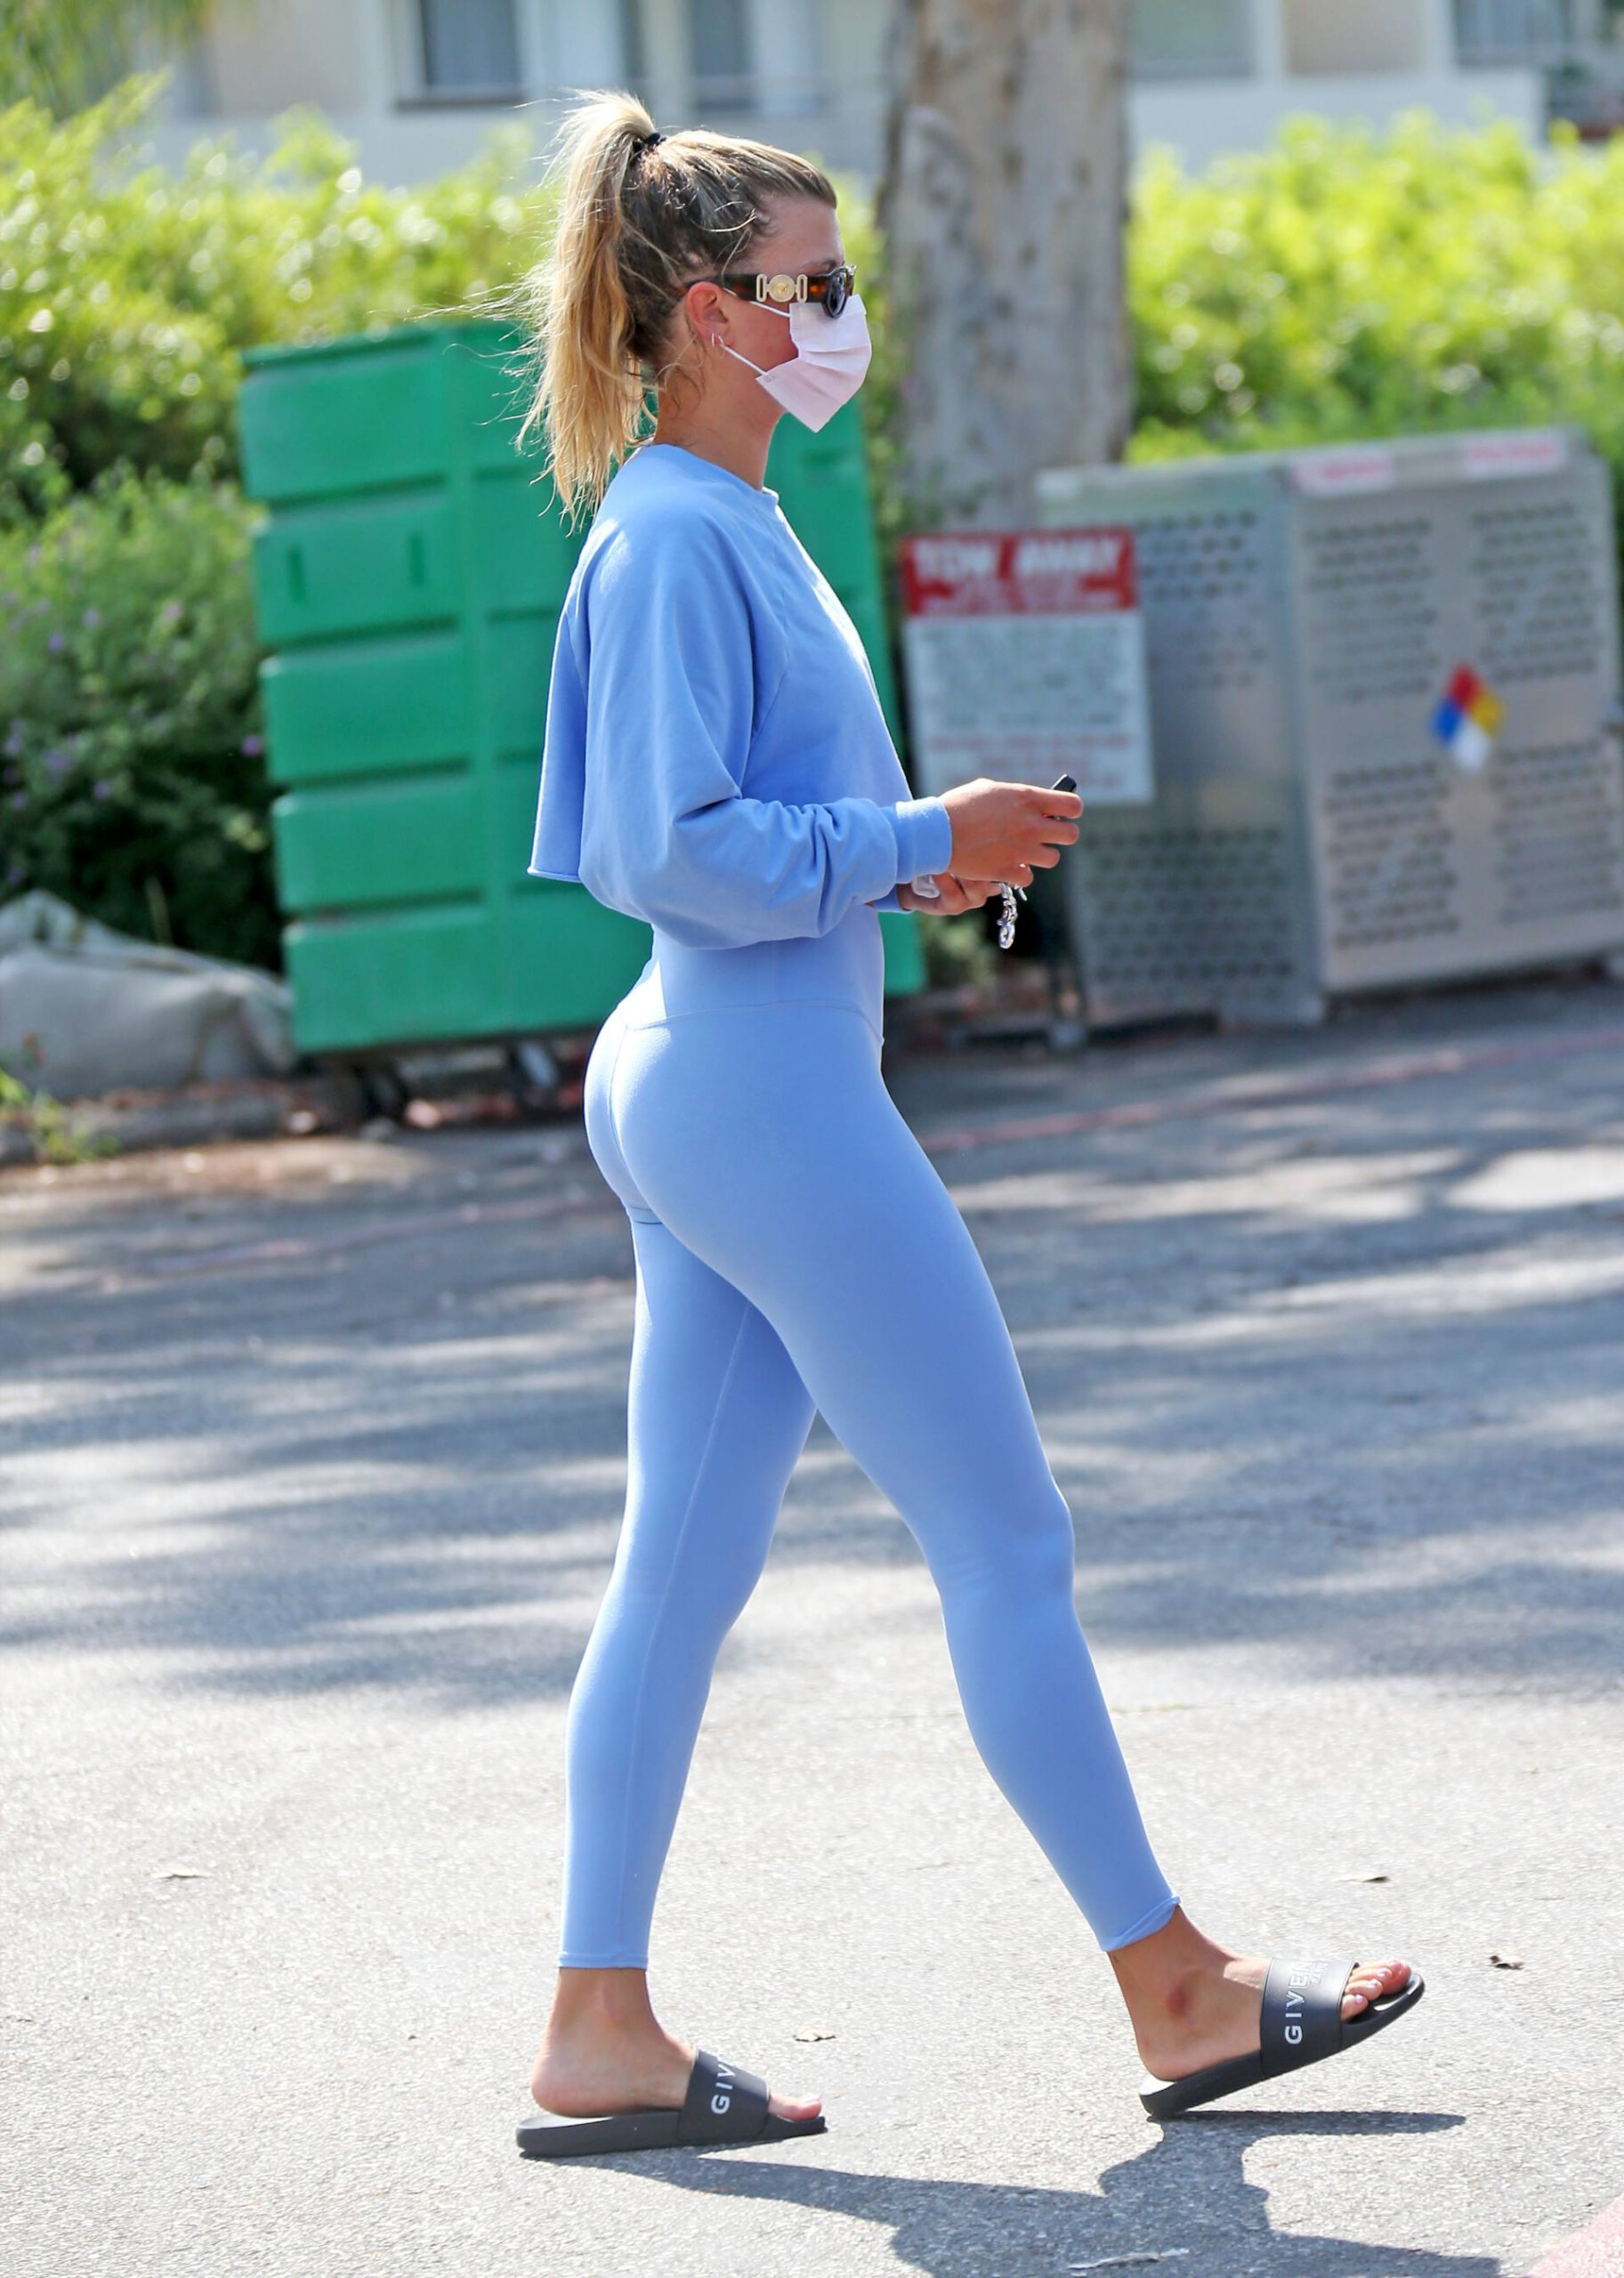 Sofia Richie Hot Ass In Yoga Pants